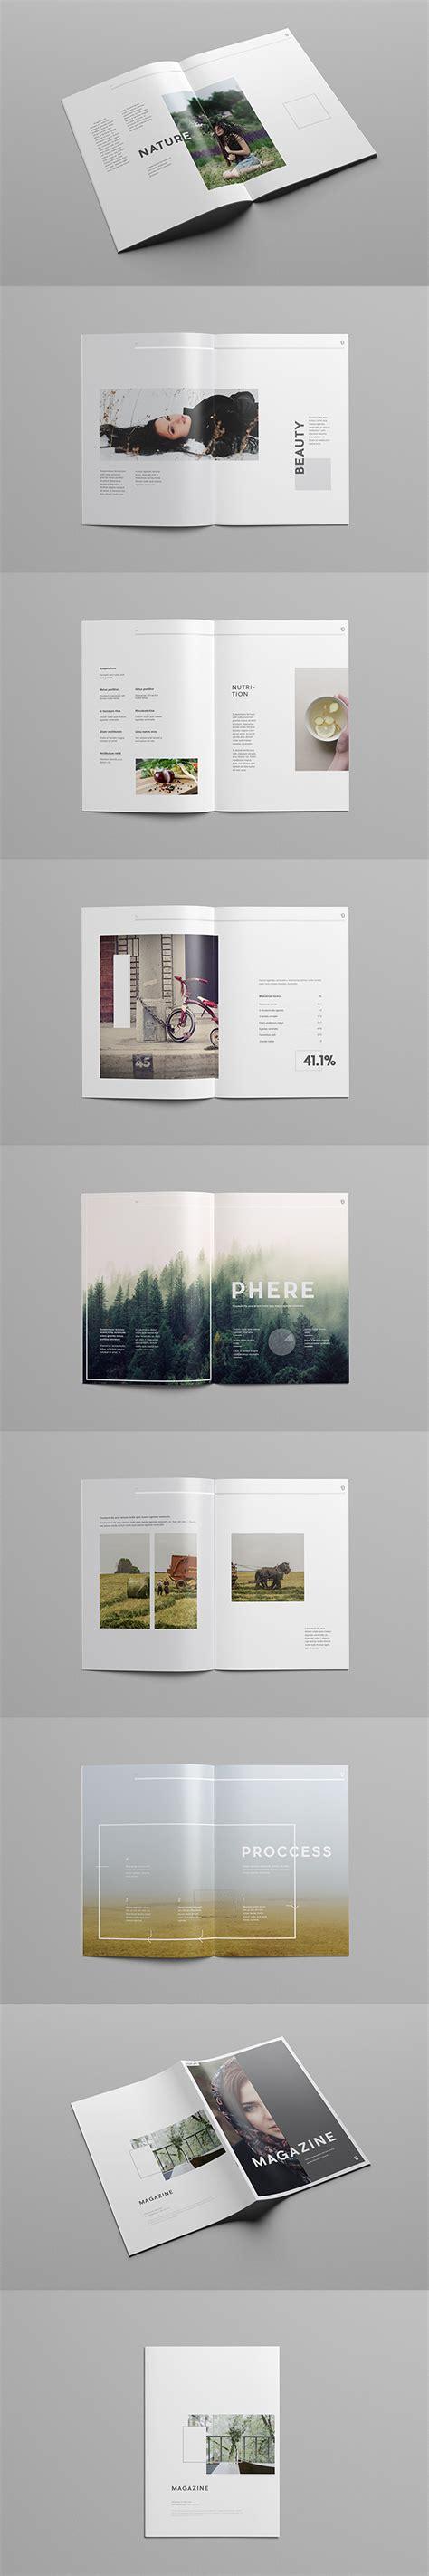 magazine template for adobe illustrator simple illustrator magazine template